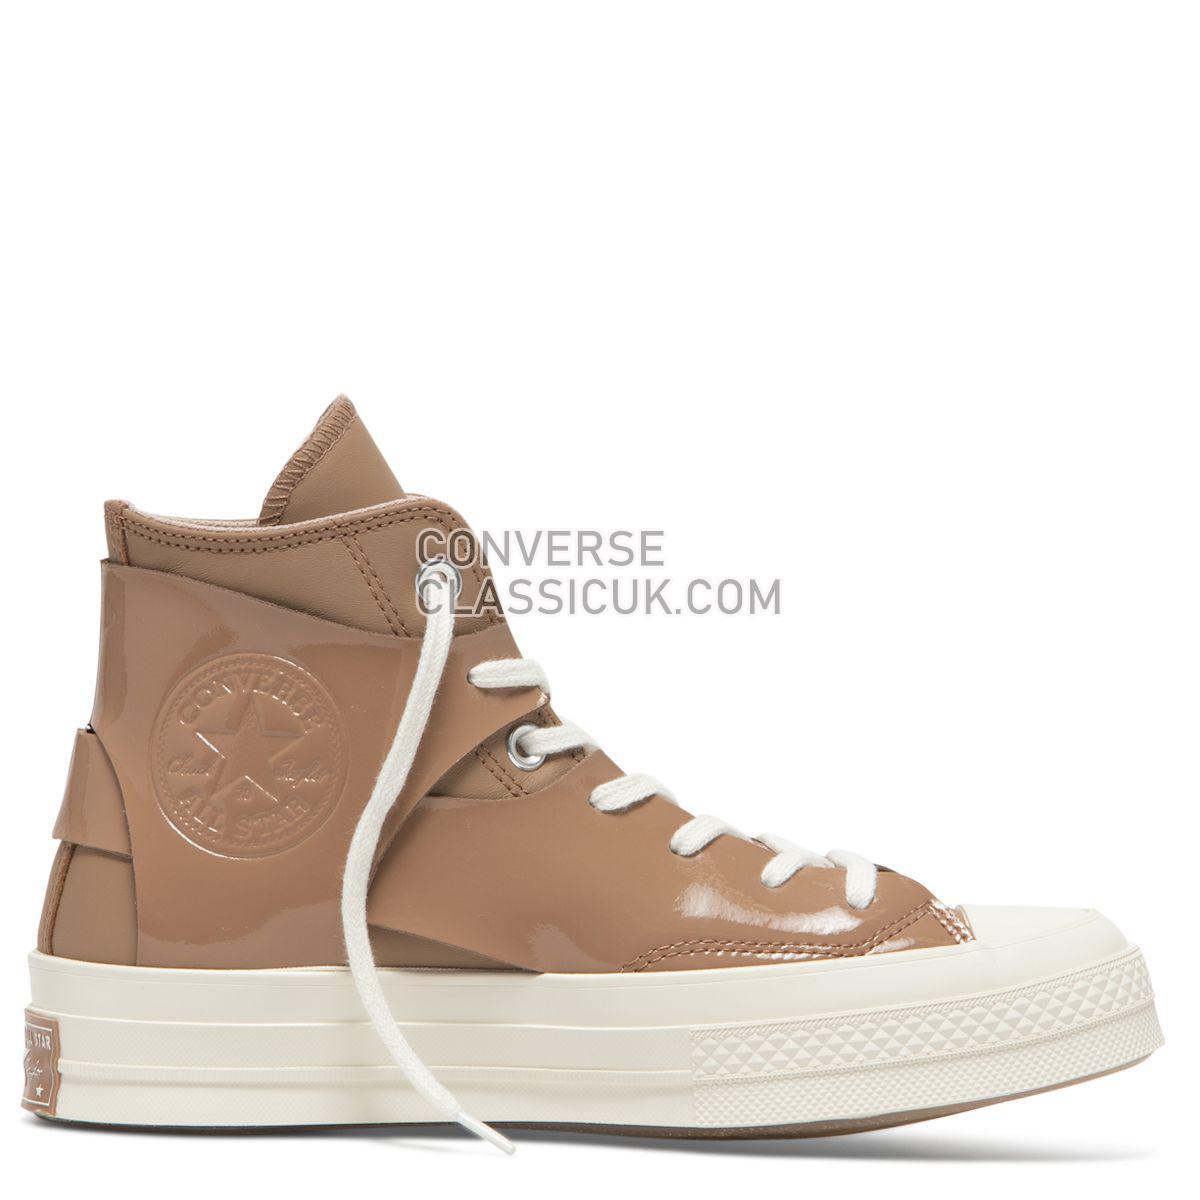 Converse X Feng Chen Wang Chuck Taylor All Star 70 High Top Cafe Au Lait Womens 565540 Cafe Au Lait/Egret/Cameo Rose Shoes